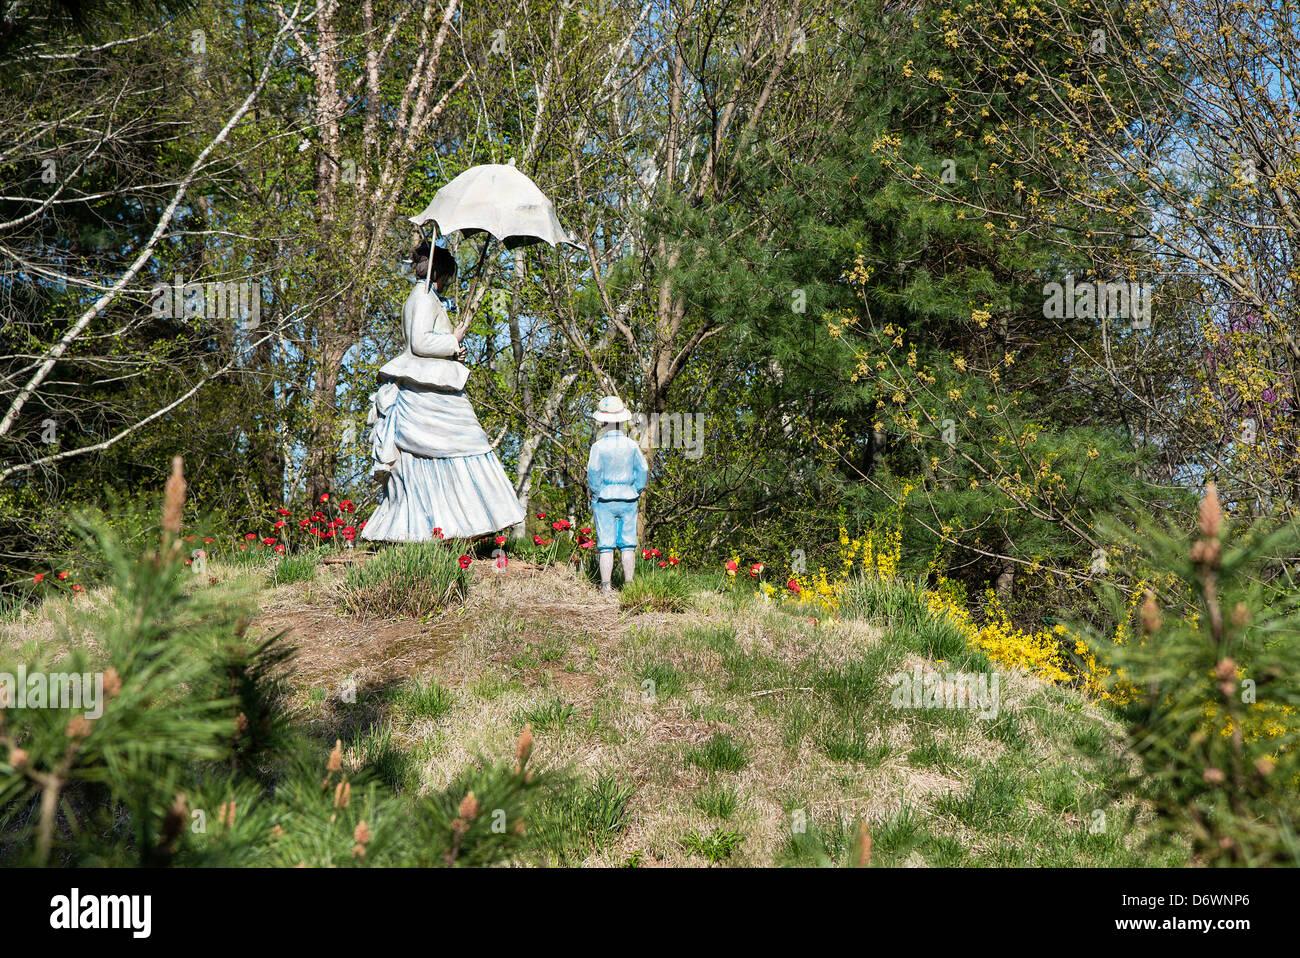 Hommage an Monet, Gründe für Skulptur, Hamilton, New Jersey, USA Stockbild